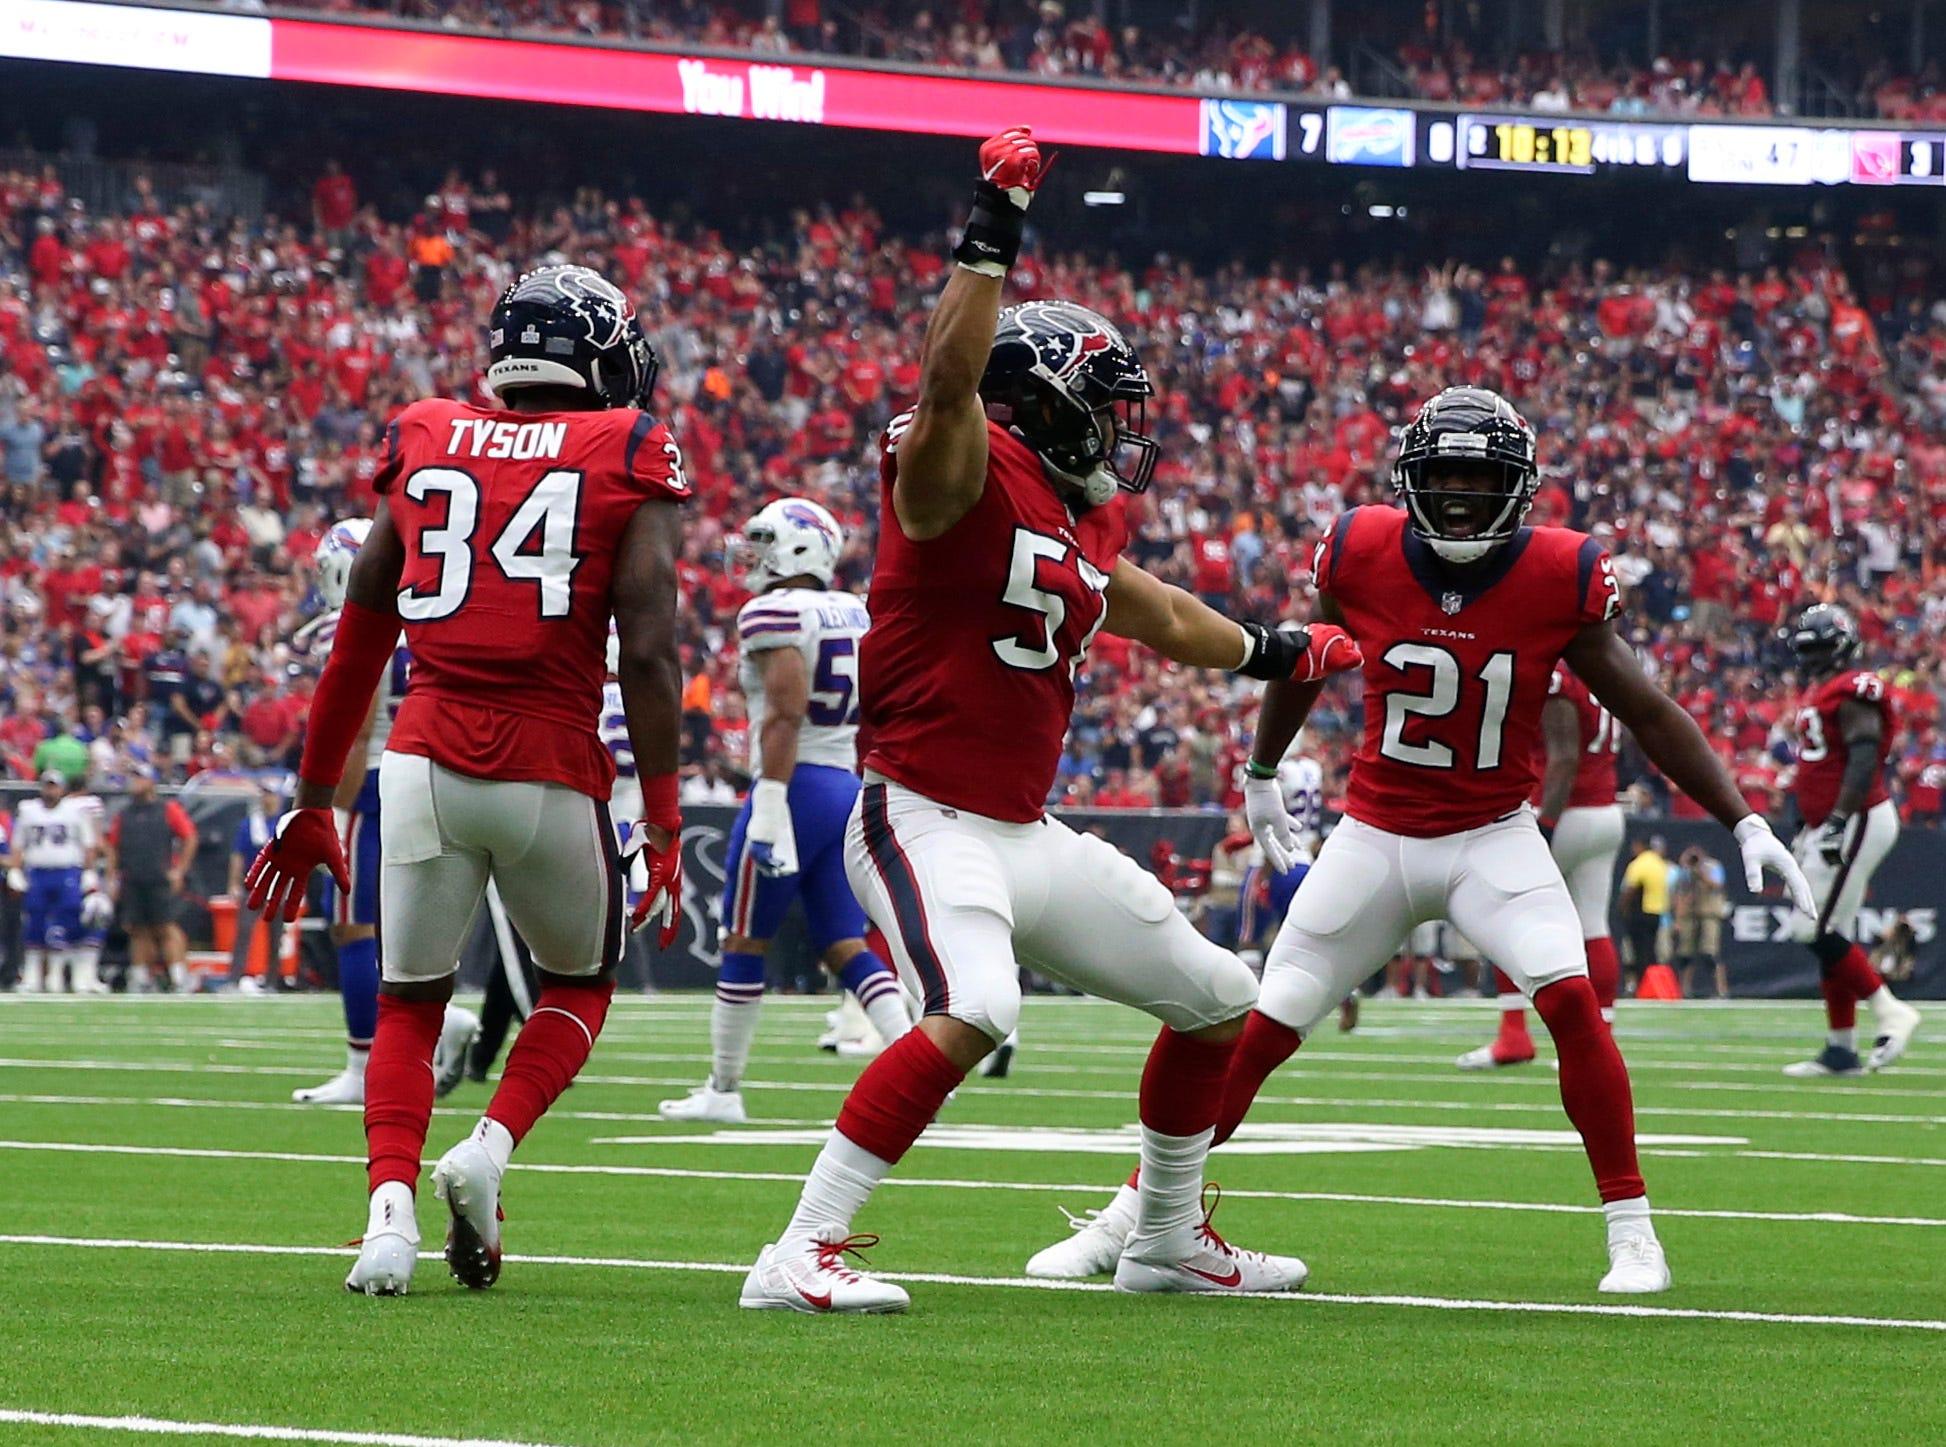 Oct 14, 2018; Houston, TX, USA; Houston Texans linebacker Brennan Scarlett (57) celebrates with teammates after blocking a punt during the second quarter against the Buffalo Bills at NRG Stadium. Mandatory Credit: Kevin Jairaj-USA TODAY Sports